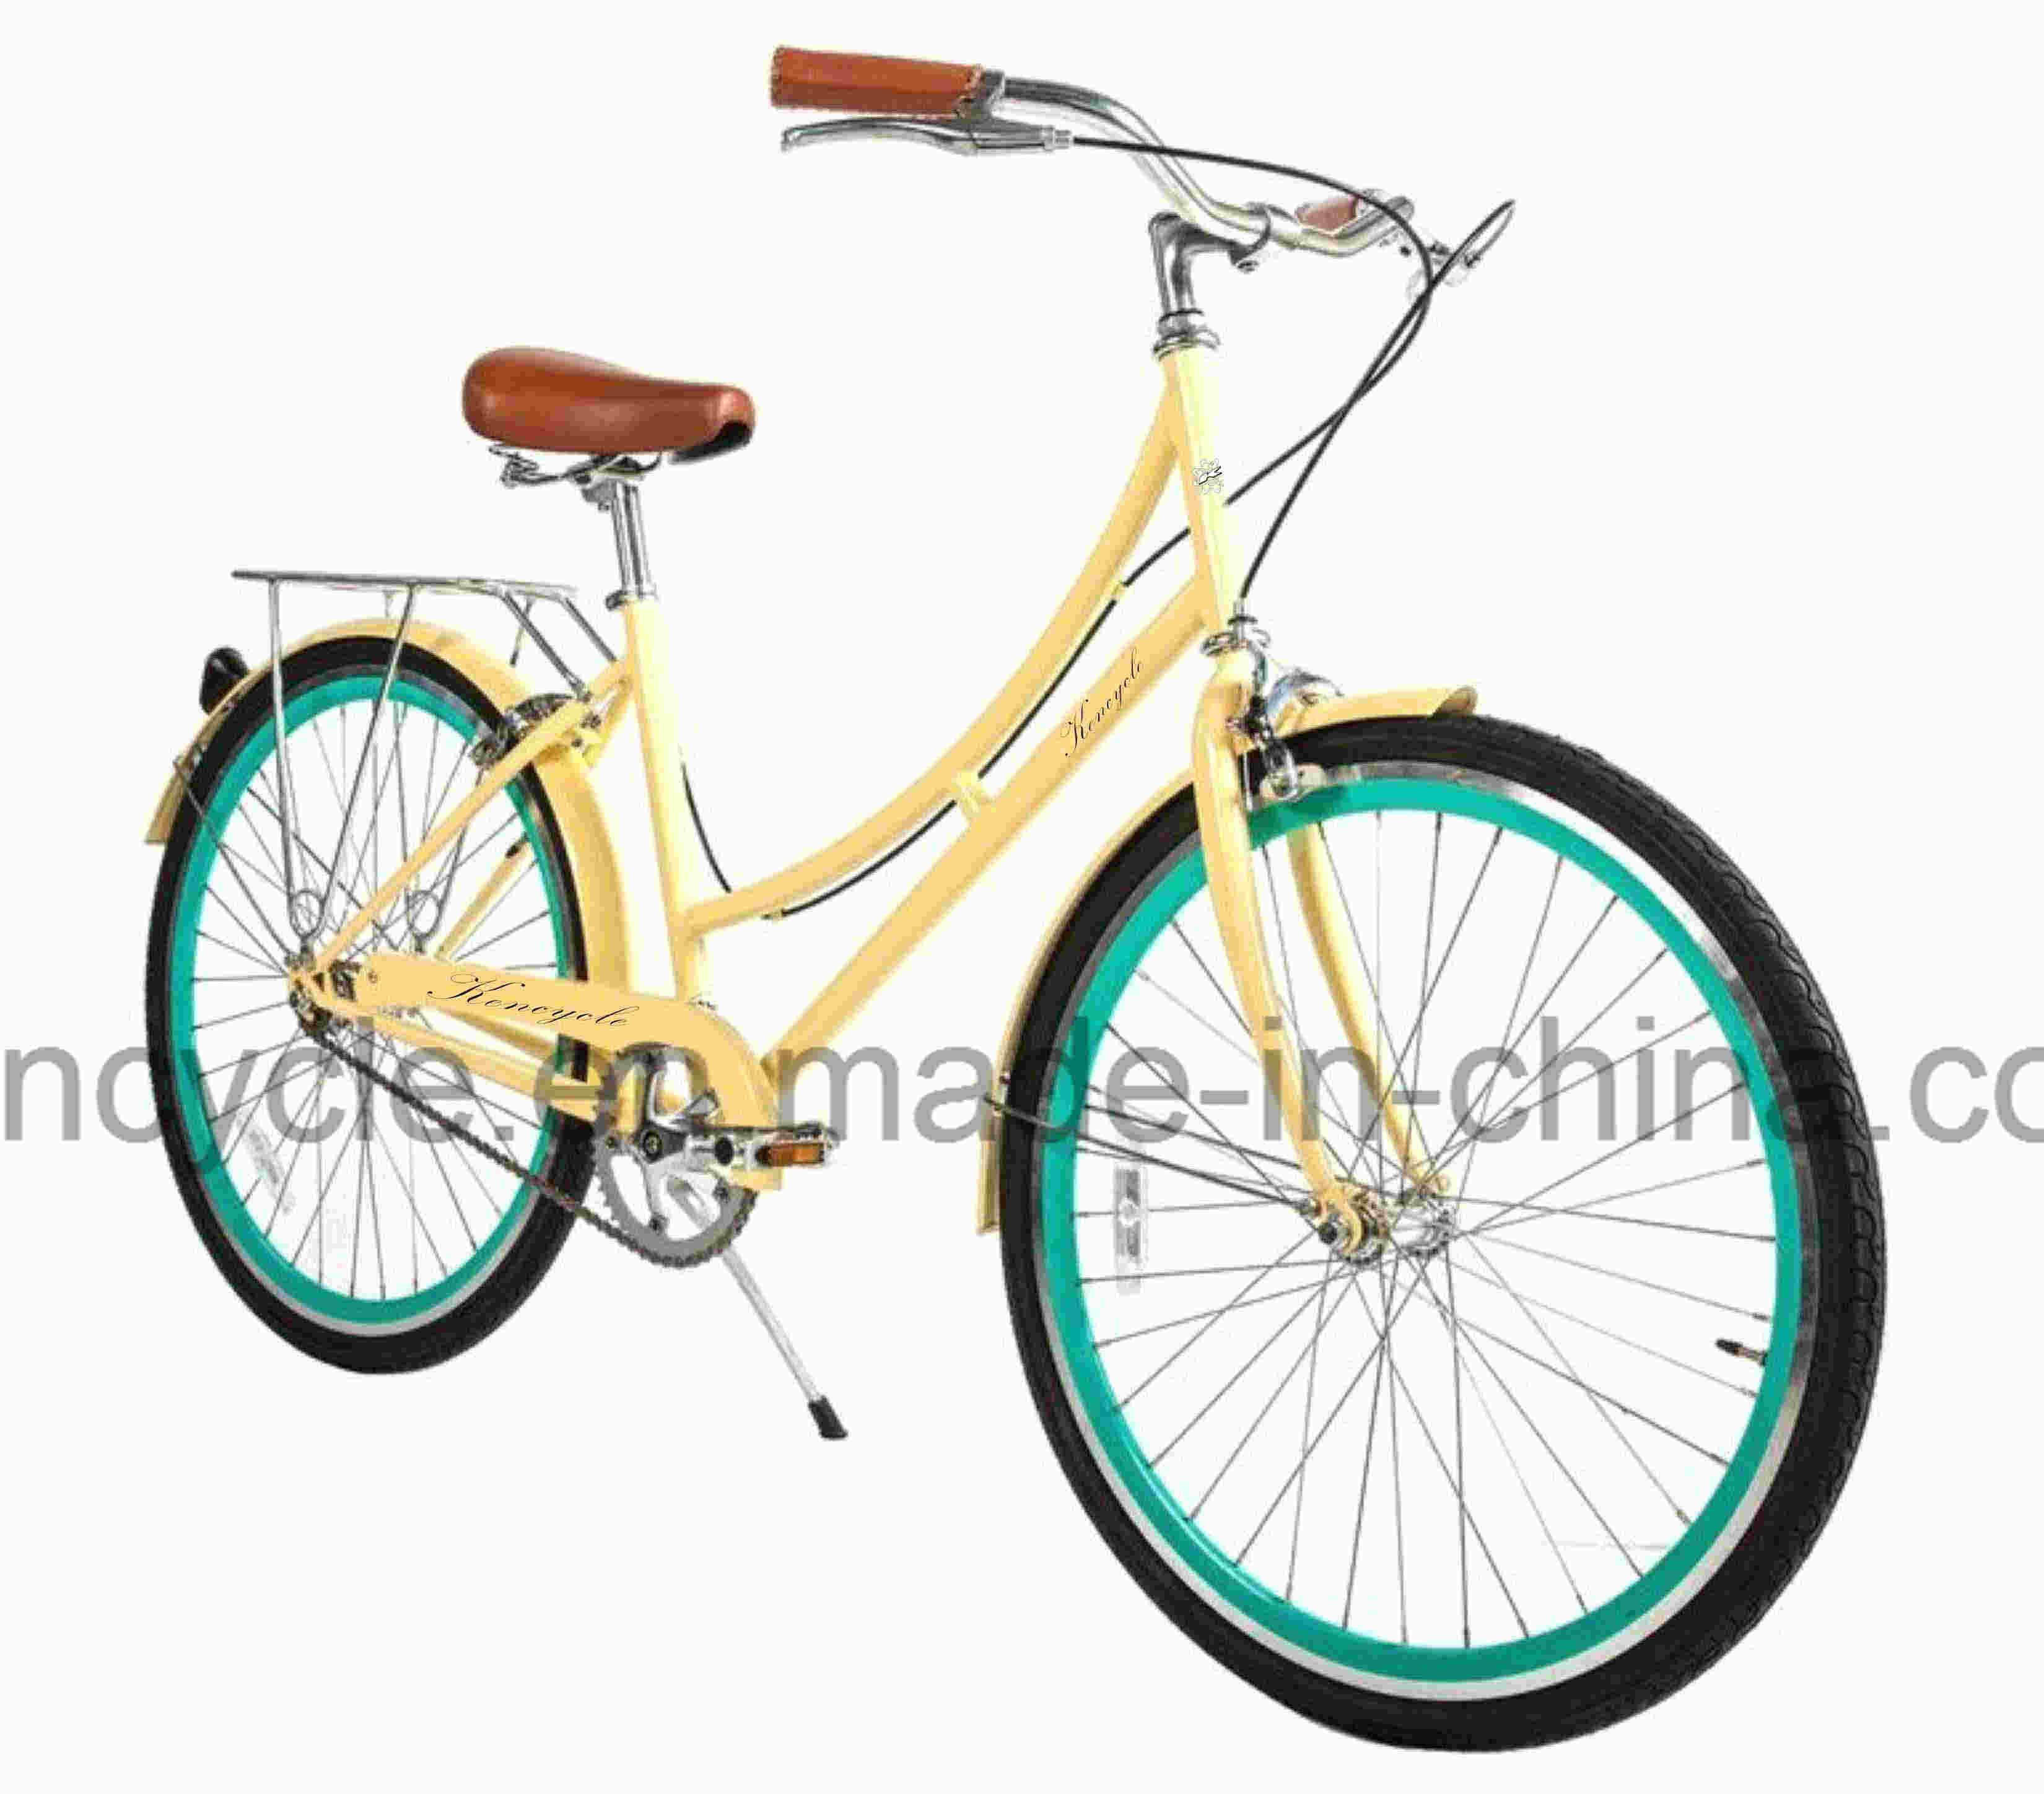 700c Single Speed Retro Holland Dutch Bike Laides Dutch City Bike Netherlands Dutch Bikes/City Bike